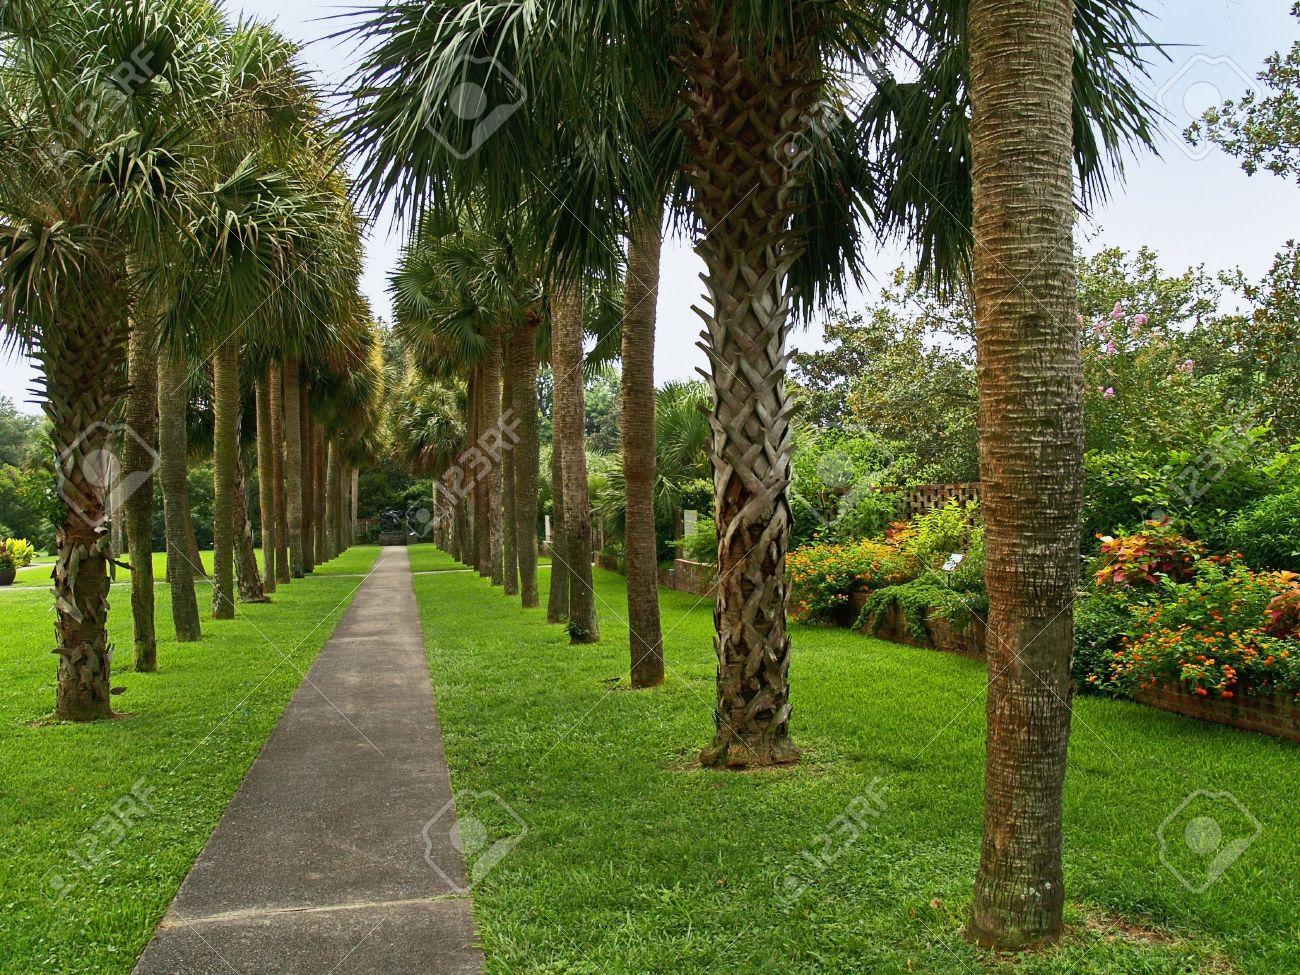 Botanical Gardens Myrtle Beach - purplebirdblog.com -